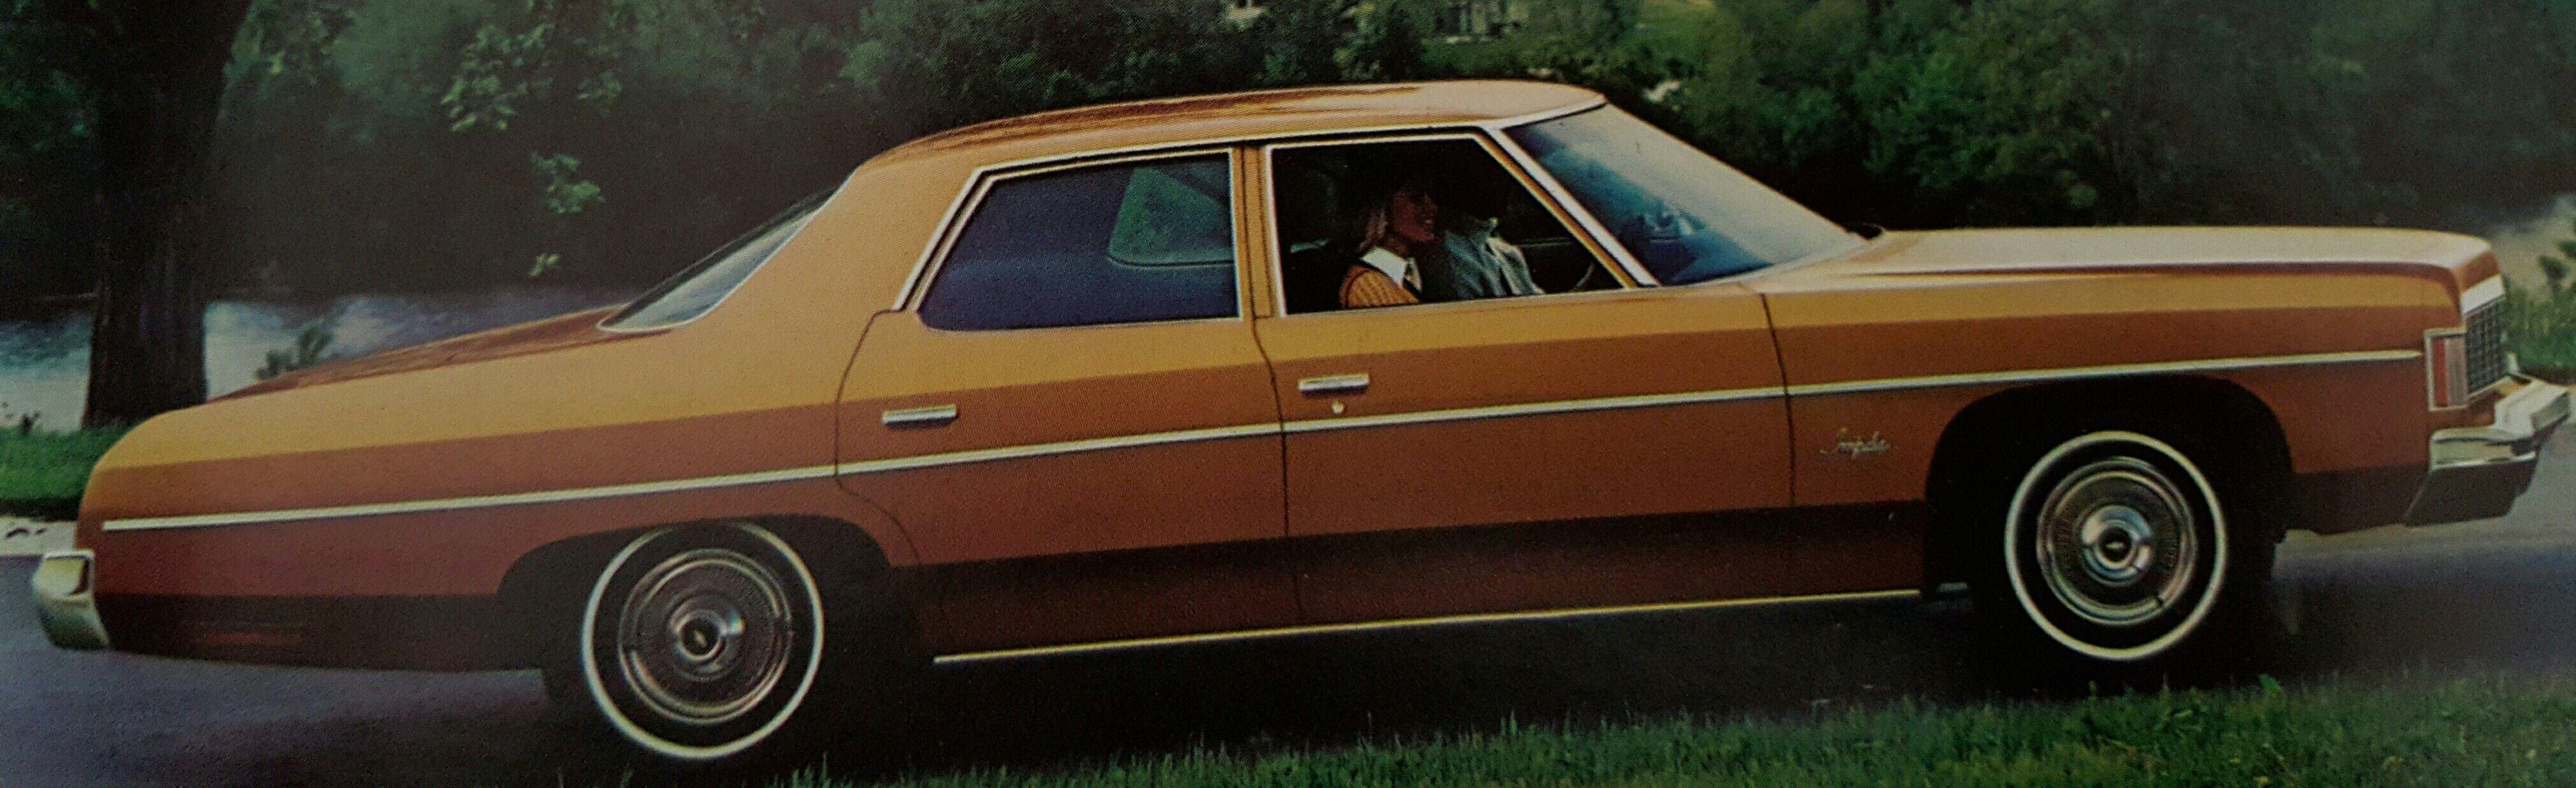 small resolution of 1974 chevrolet impala chevrolet trucks chevrolet impala chevy chevy impala